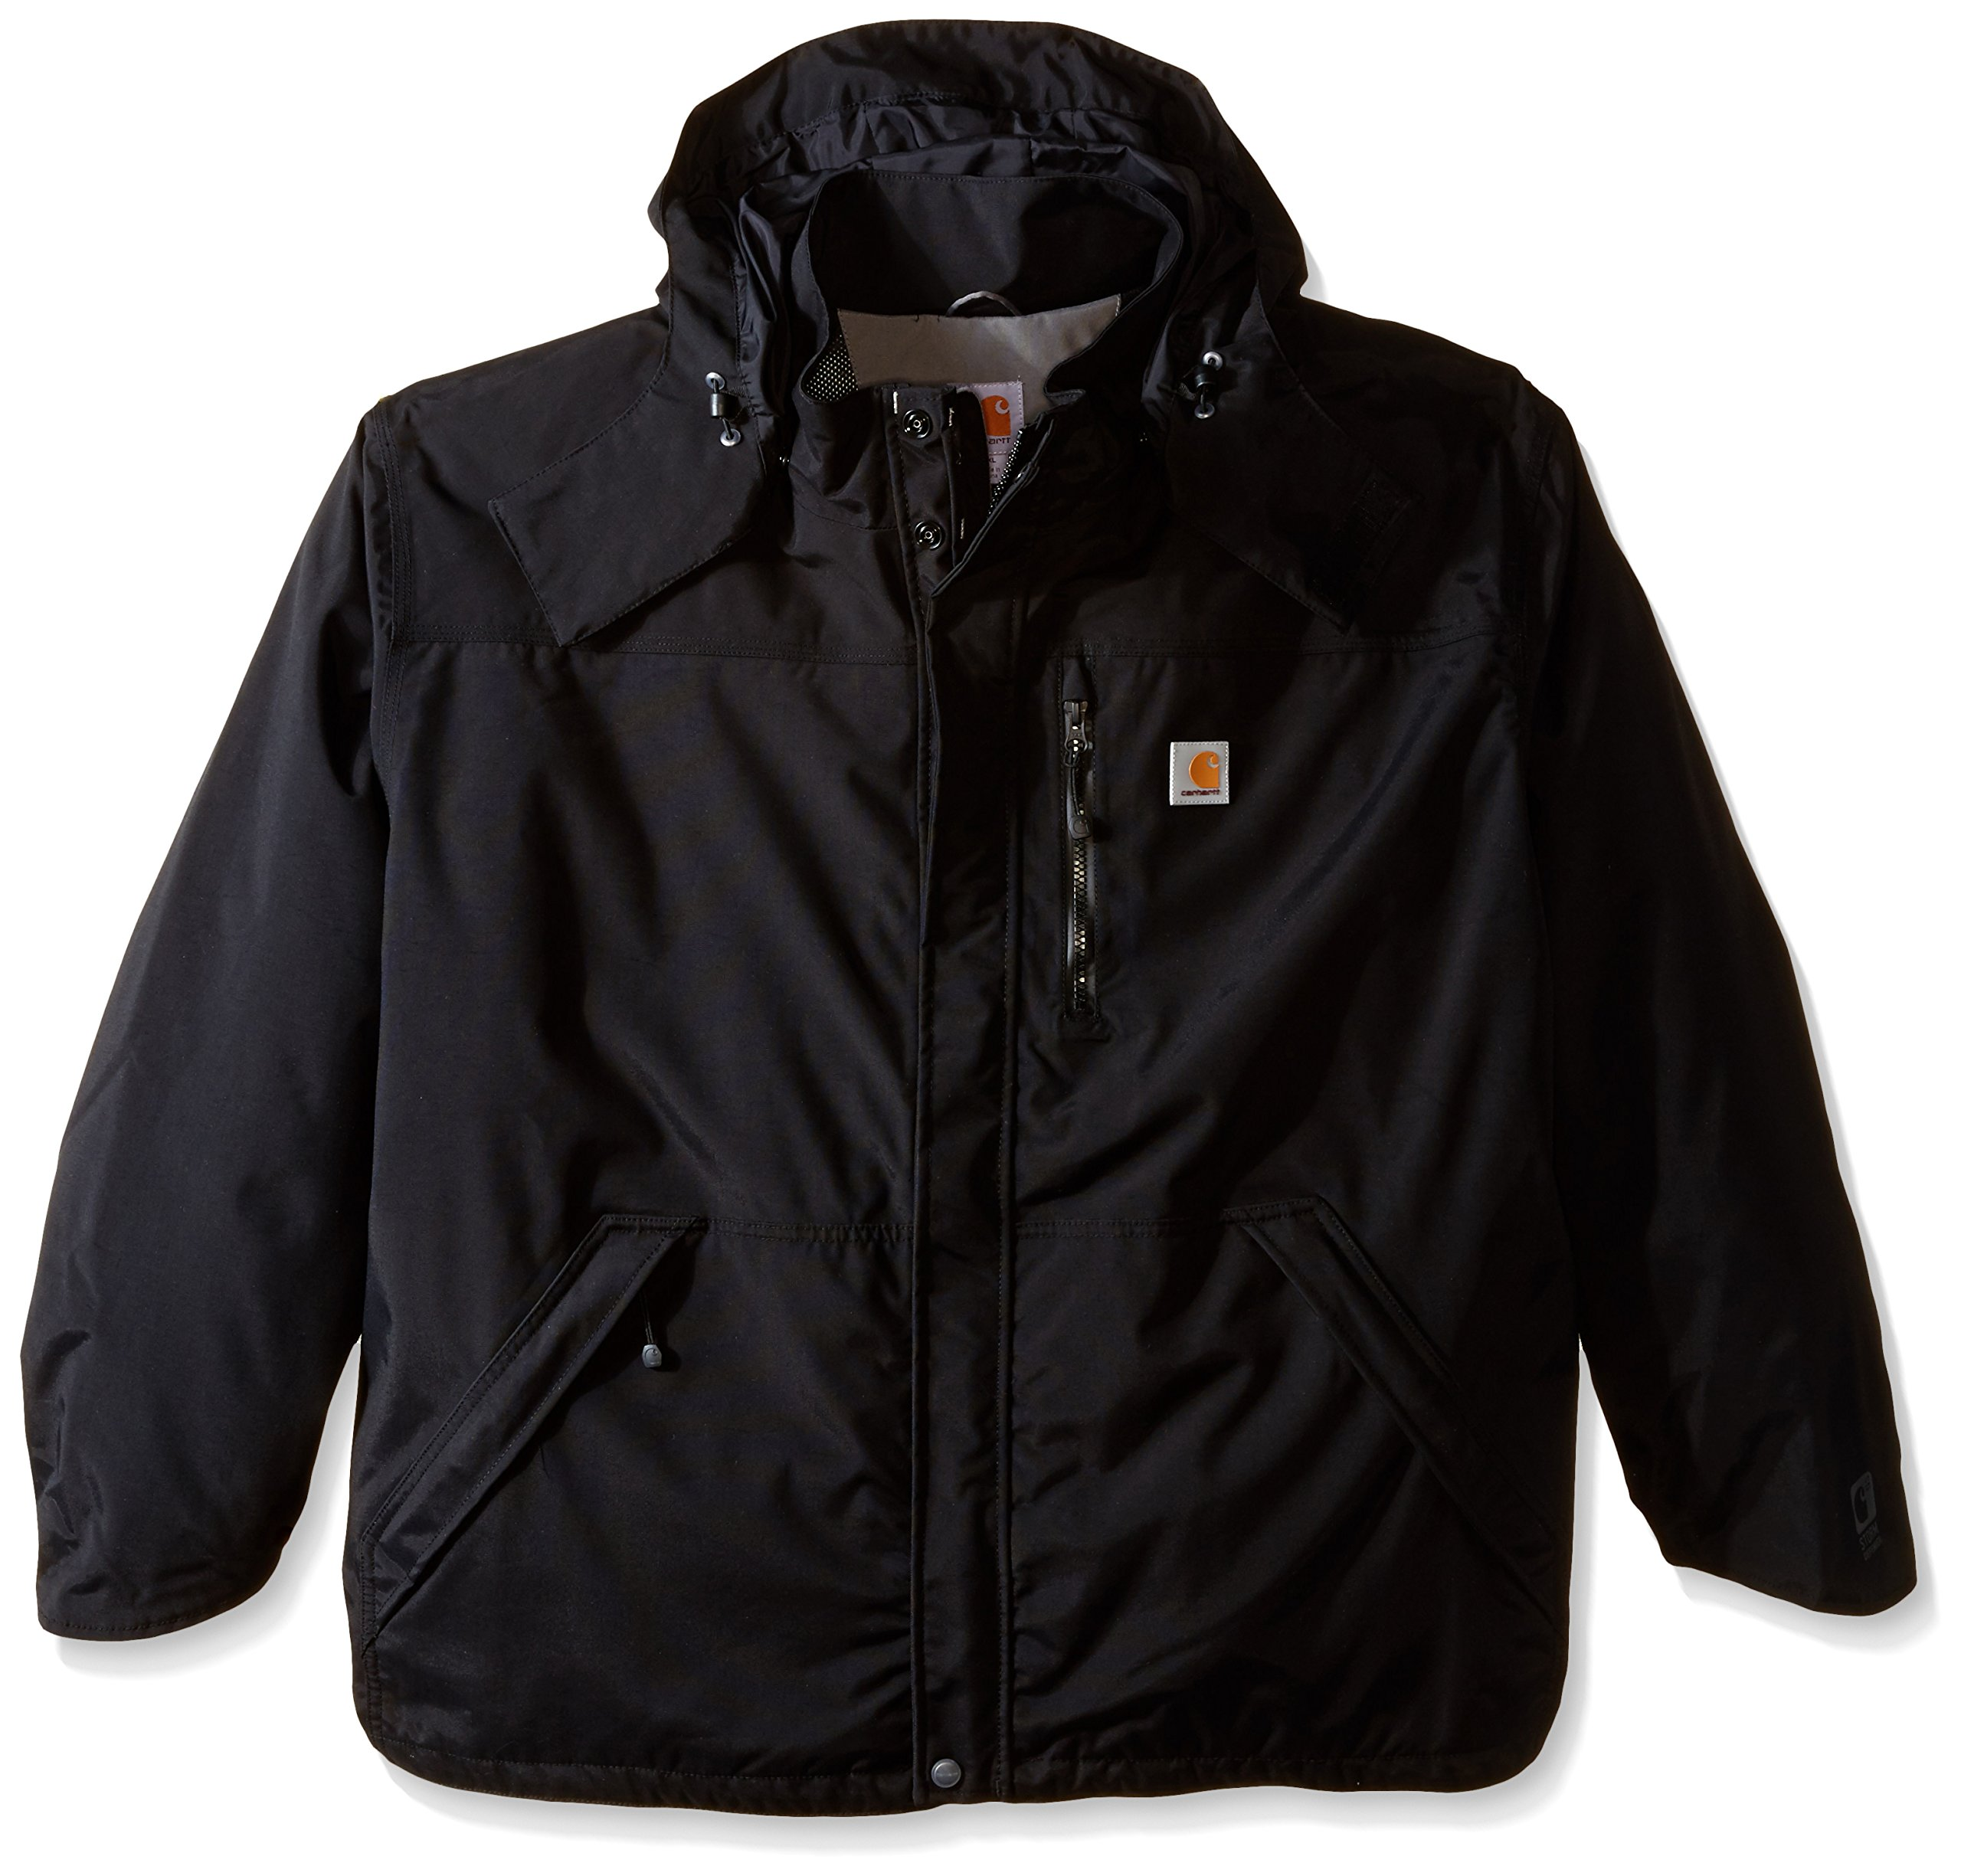 Carhartt Men's Big & Tall Shoreline Jacket Waterproof Breathable Nylon,Black,XXXX-Large by Carhartt